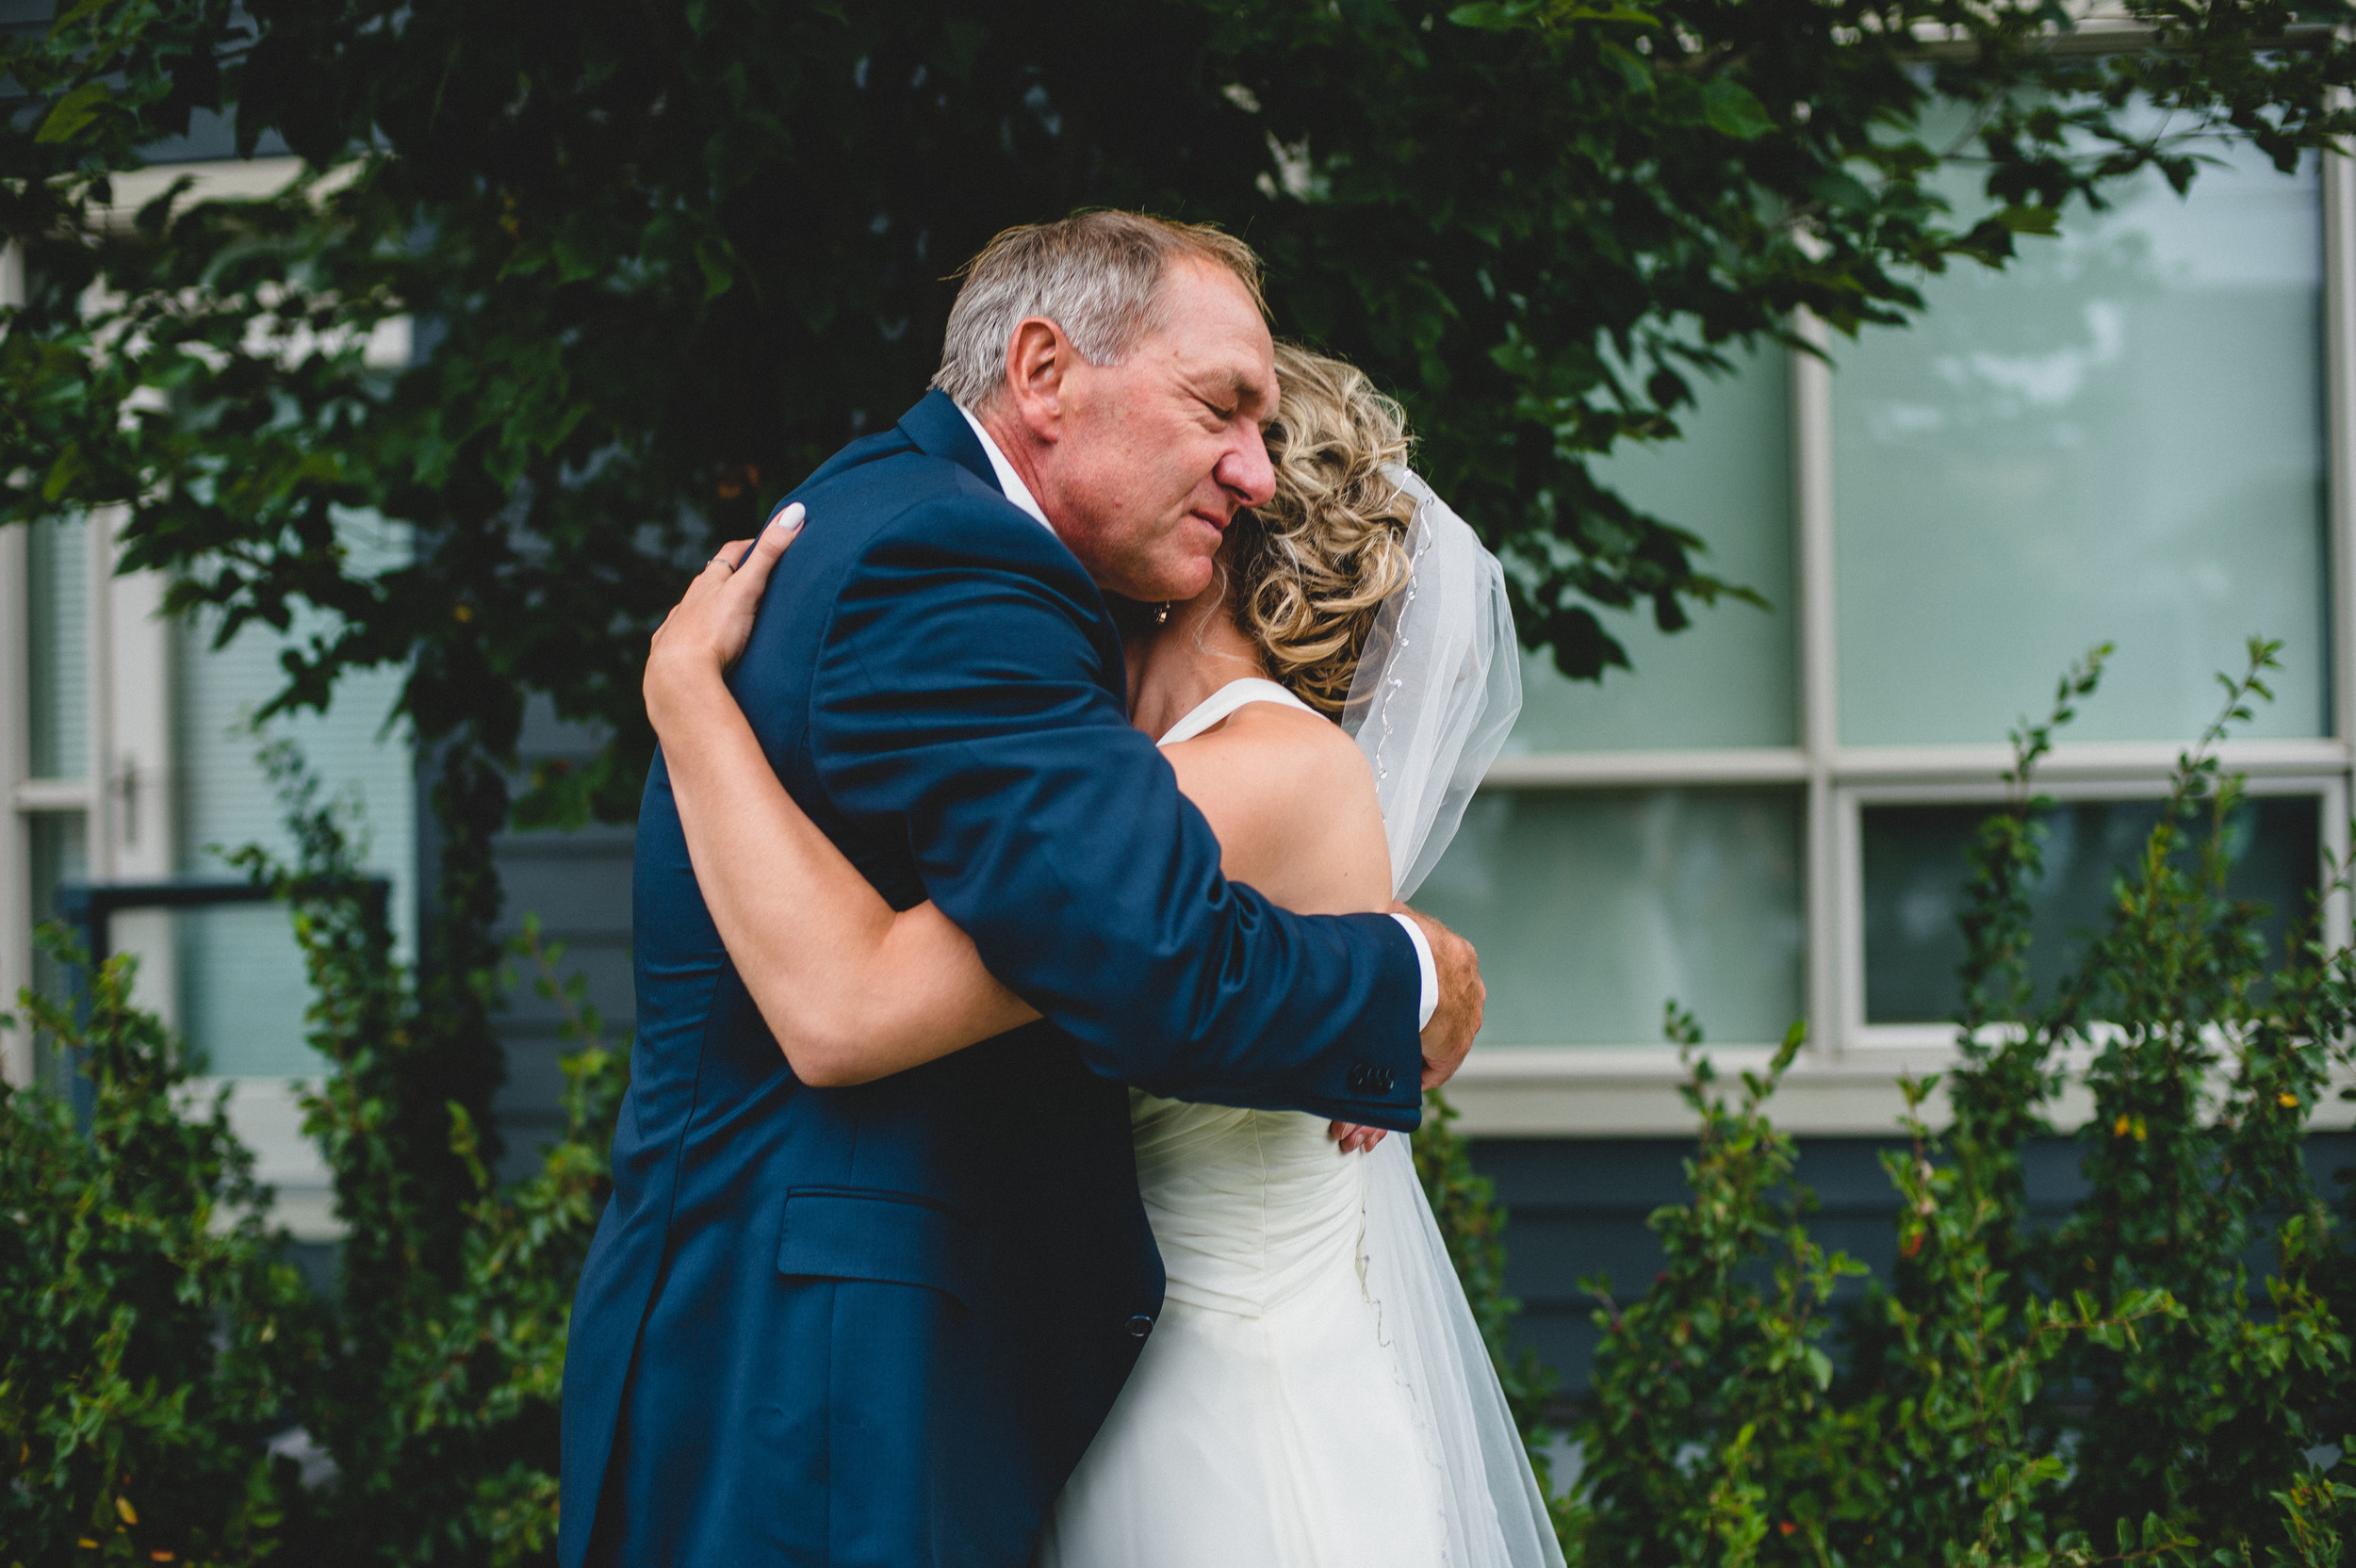 Vancouevr wedding photography edward lai photogrpaher -5.jpg